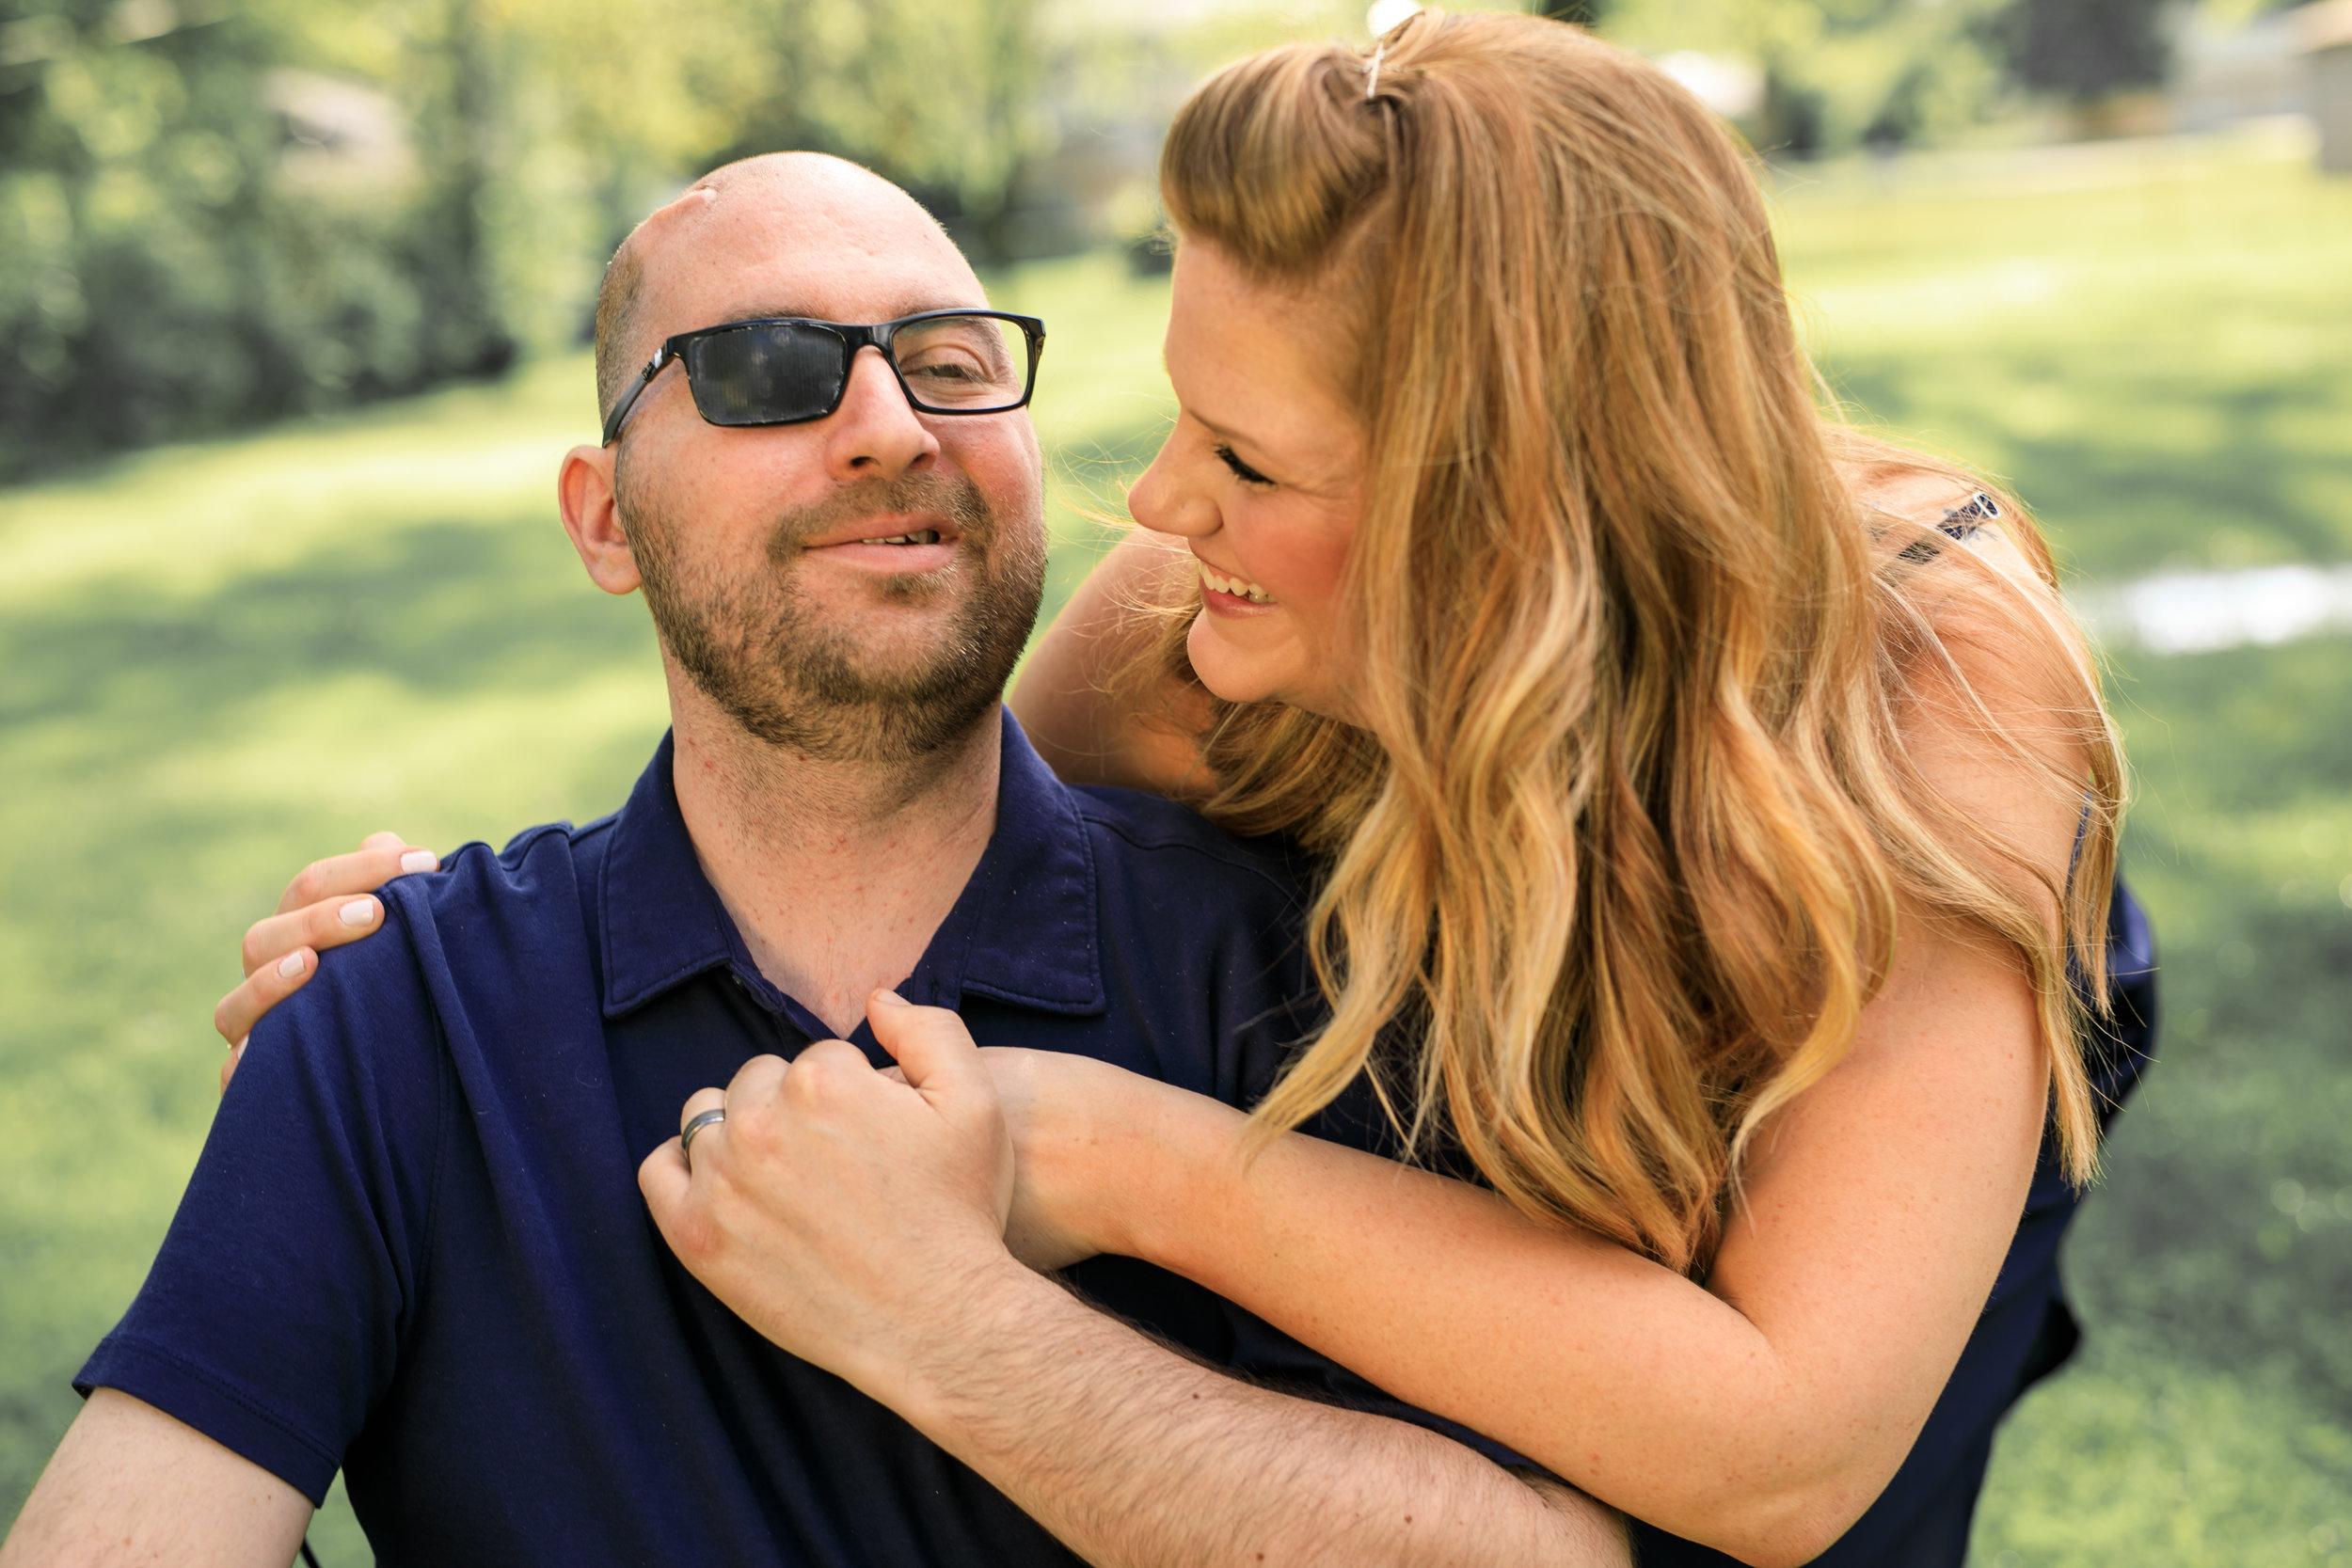 Dan-coghlan-terminally-ill-photographs-brain-cancer15.jpg